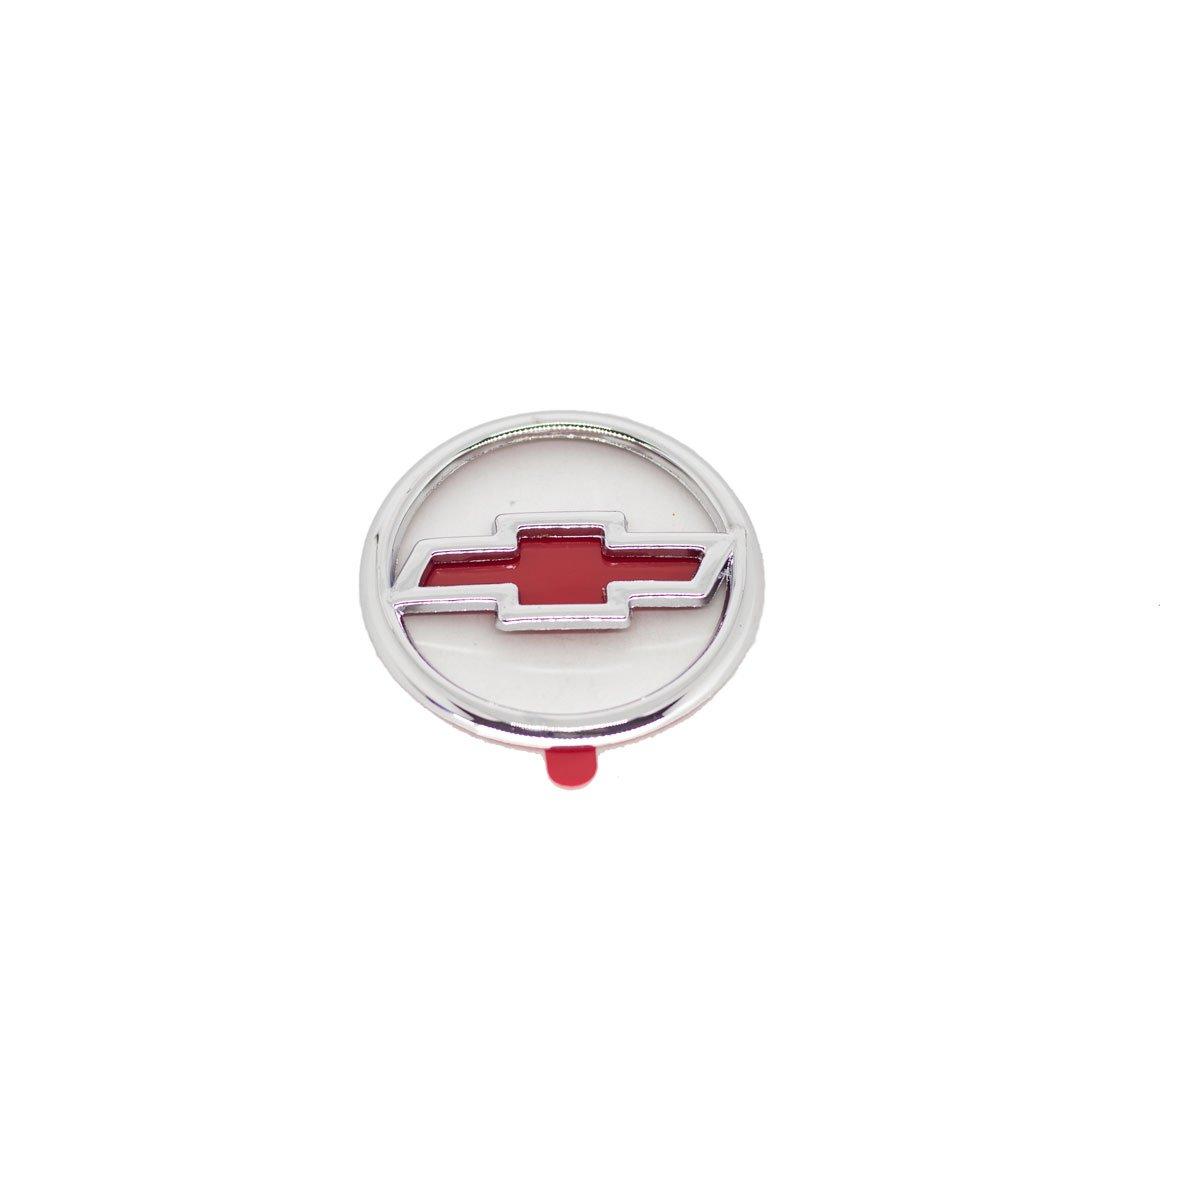 Emblema Porta Malas/Fechadura Corsa 96/ Cromado